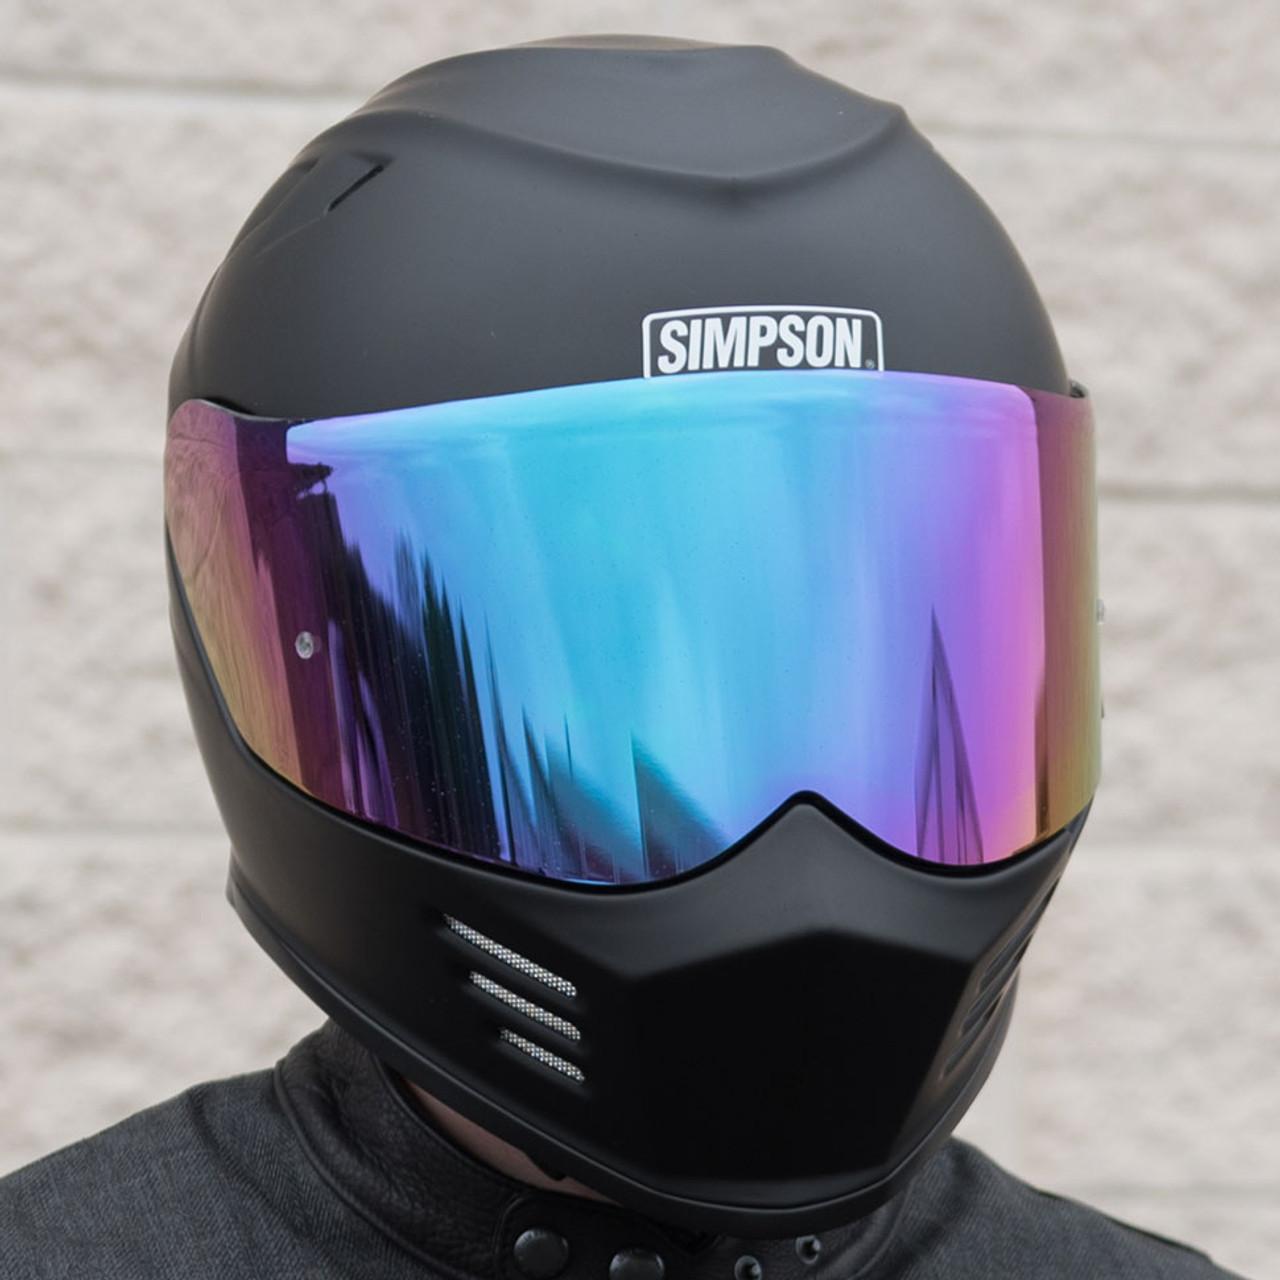 7f5e6043 Simpson Motorcycle Helmets Ghost Bandit Iridium Face Shield - GBISE ...